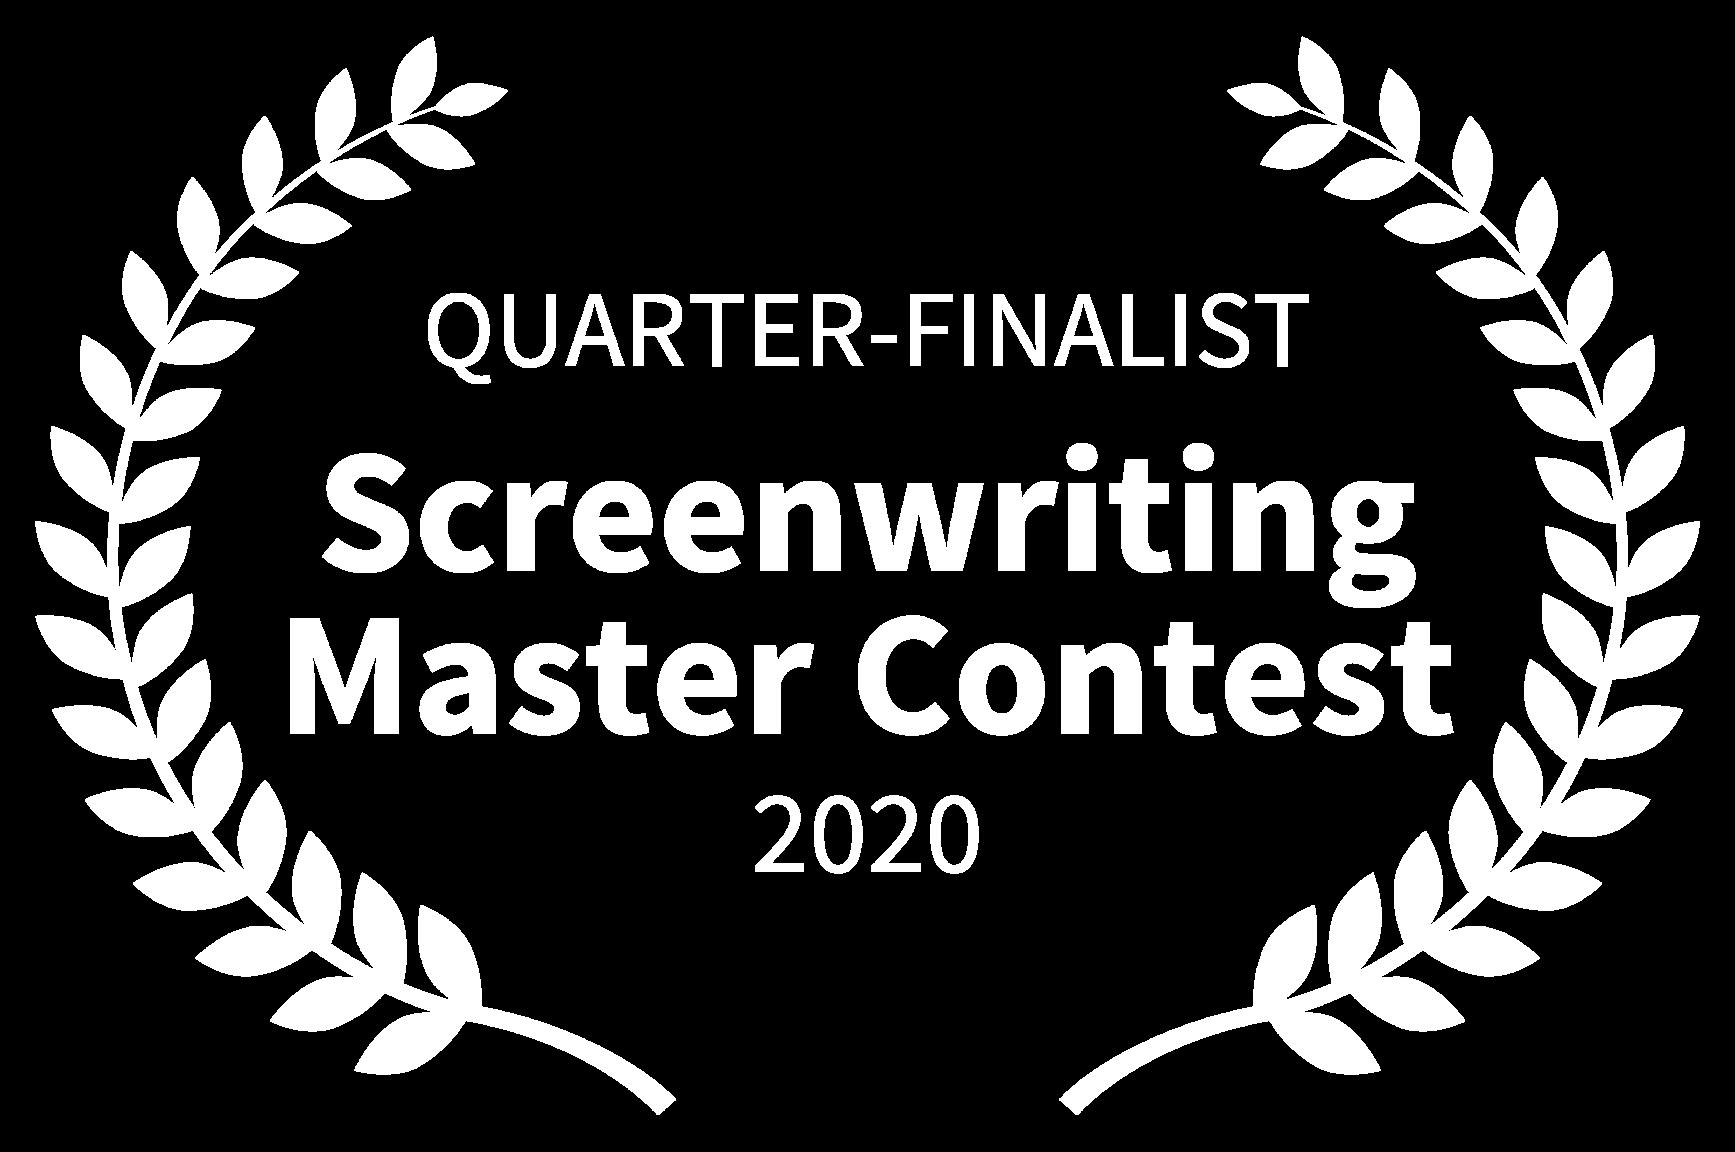 QUARTER-FINALIST-Screenwriting-Master-Contest-2020